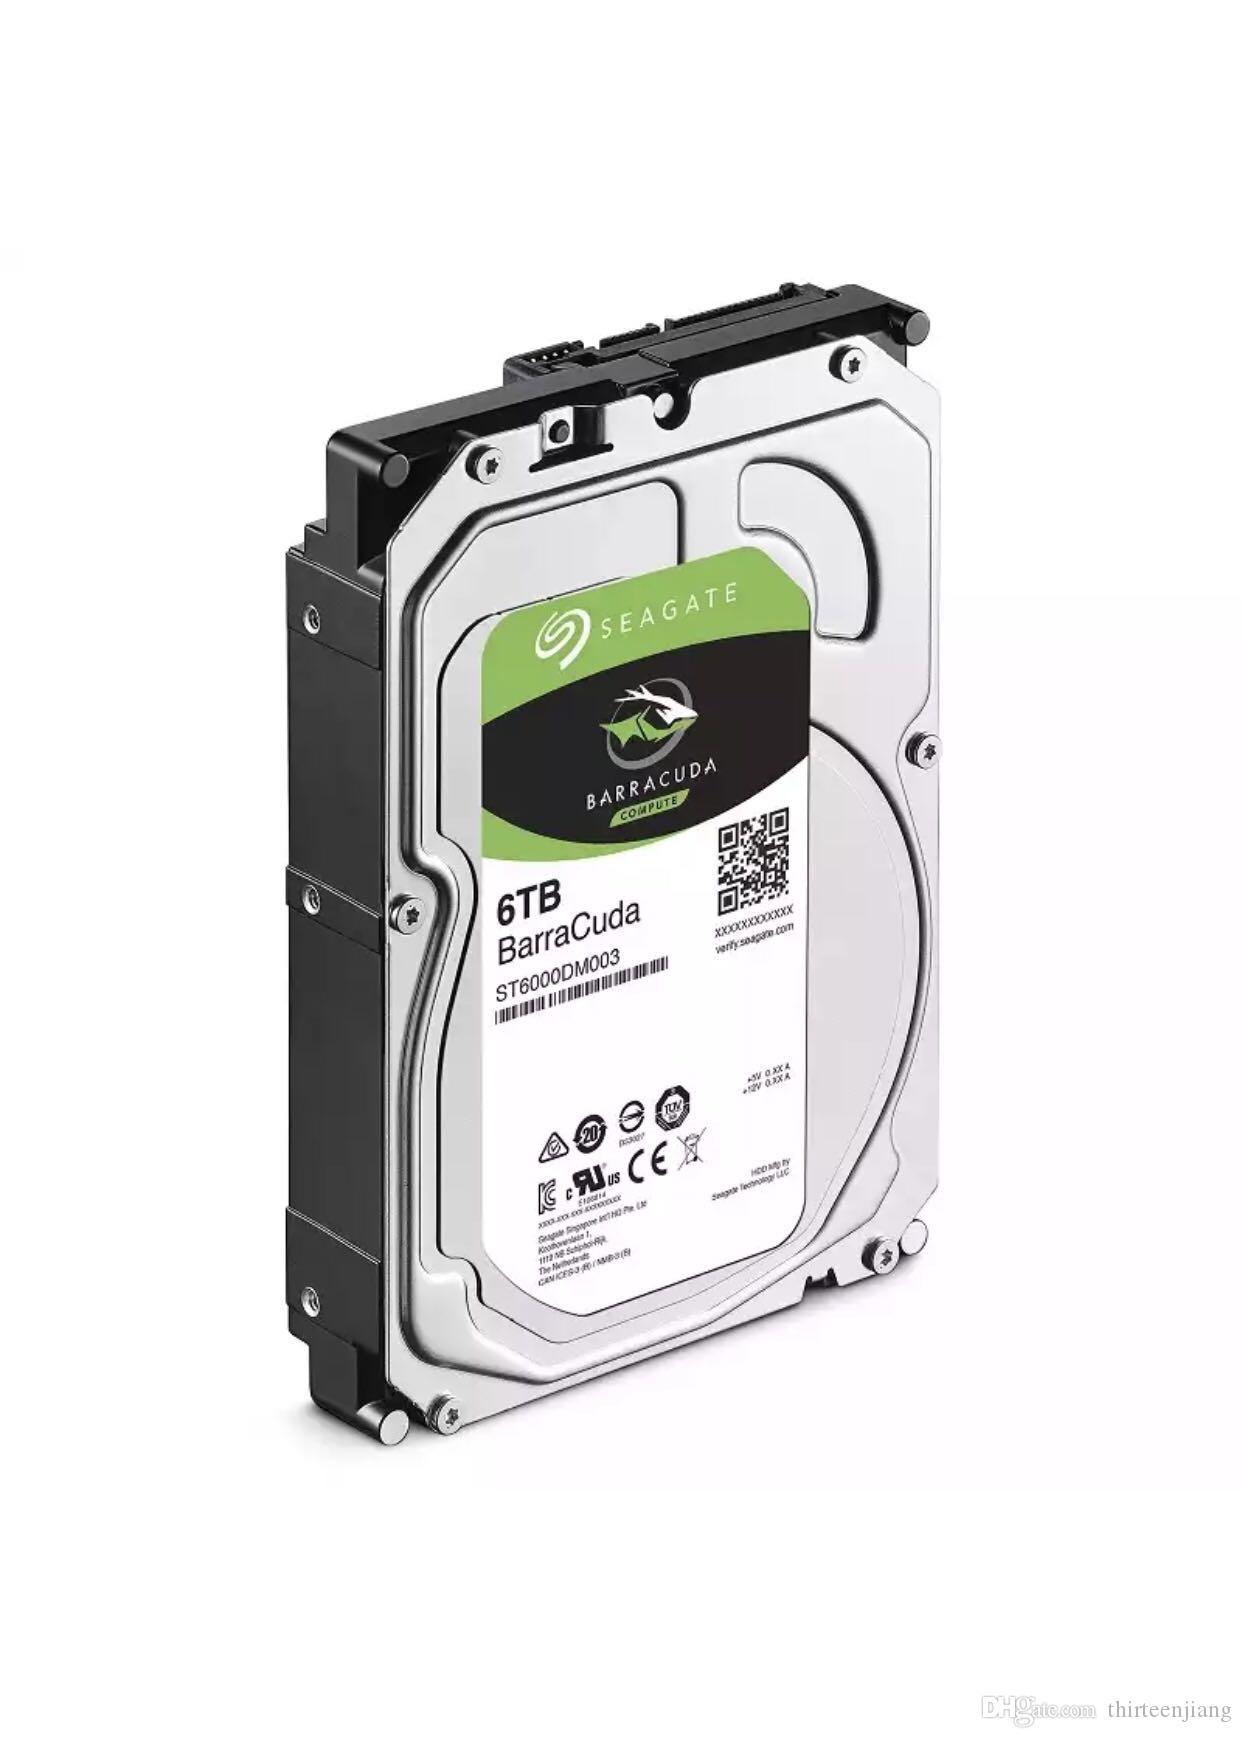 Seagate interne Festplatte 3,5 Zoll 6 TB ST6000DM003 PC-Benutzer BarraCud Japan.